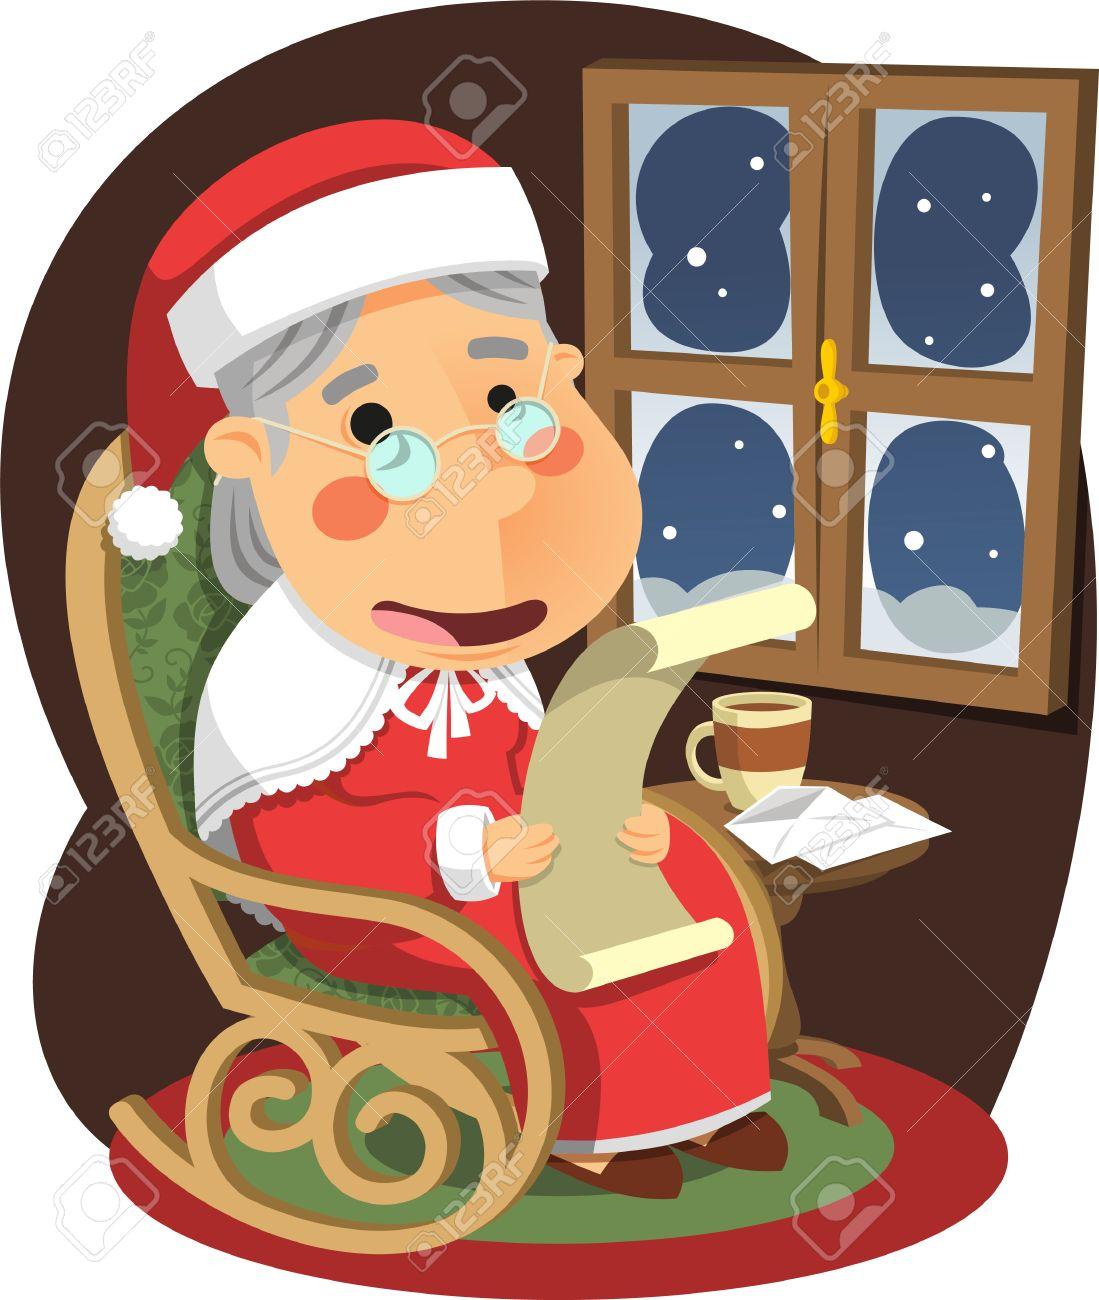 Mother Christmas Cartoon.Mrs Claus Mother Santa Christmas Vector Illustration Cartoon